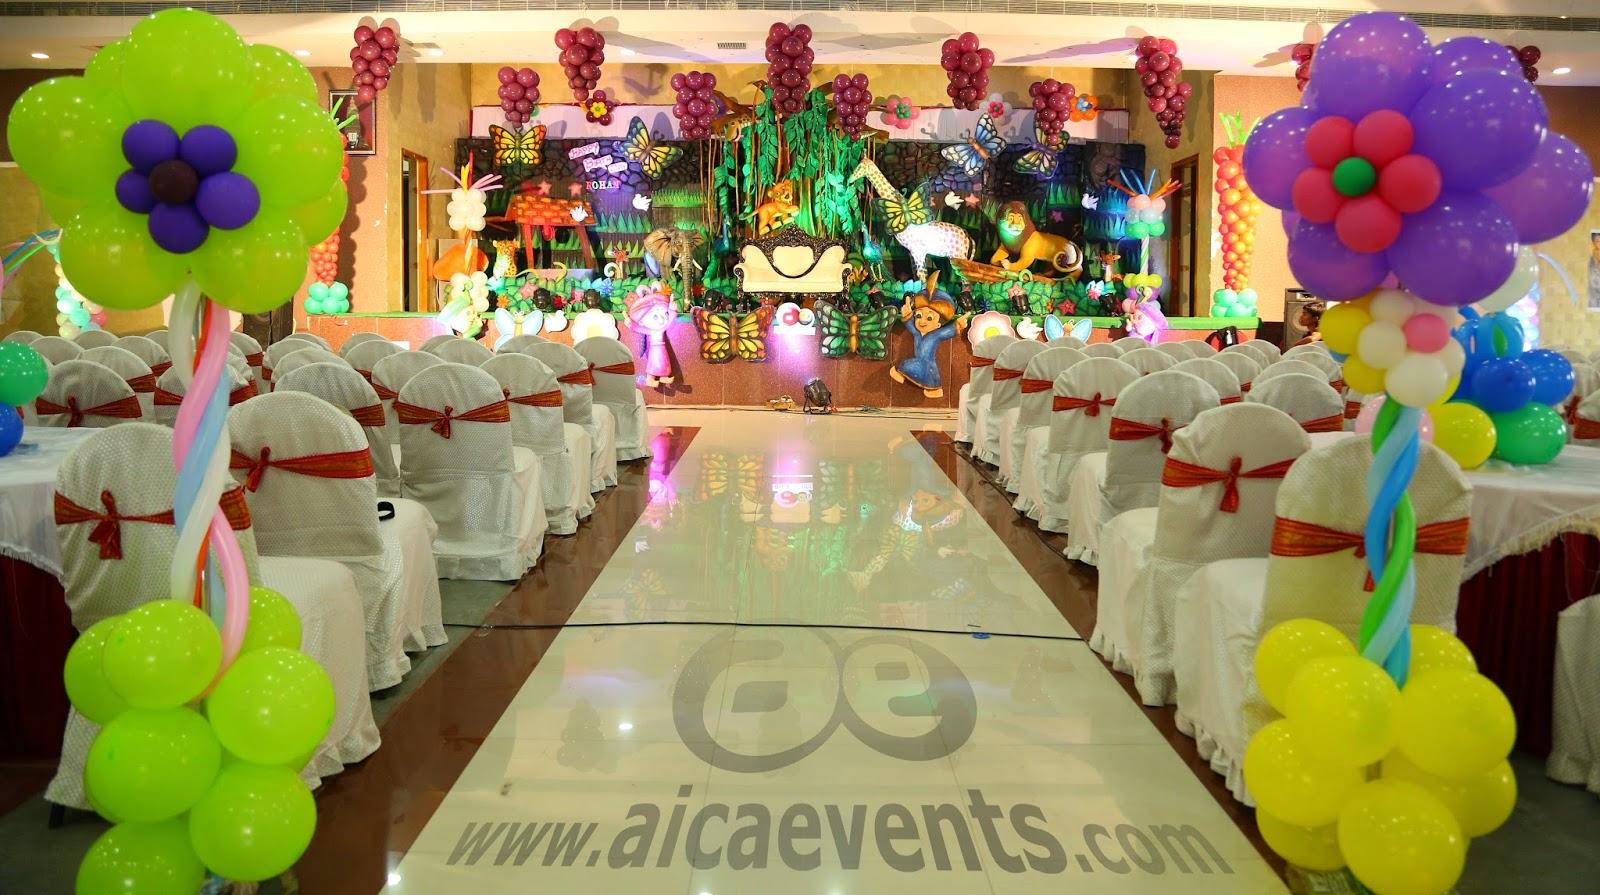 Jungle Decoration Aicaevents Jungle Theme Birthday Party Decorations